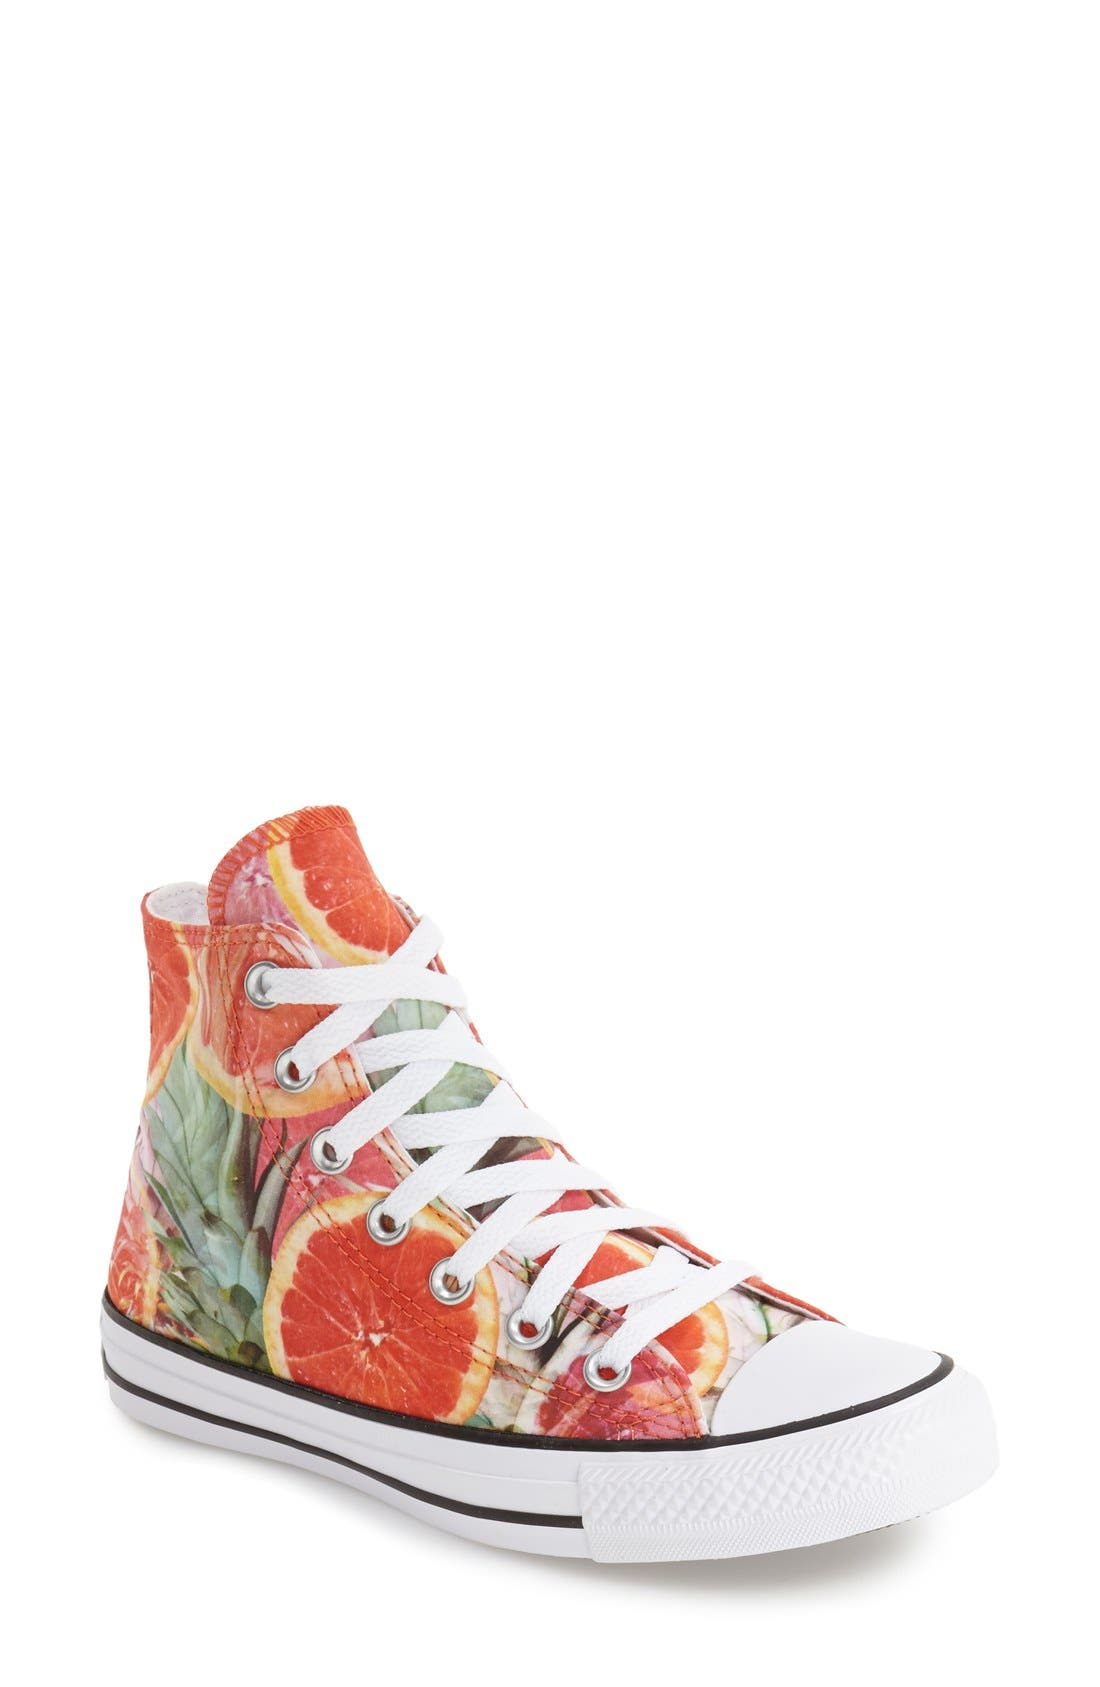 Main Image - Converse Chuck Taylor® All Star® Grapefruit Print High Top Sneaker (Women)